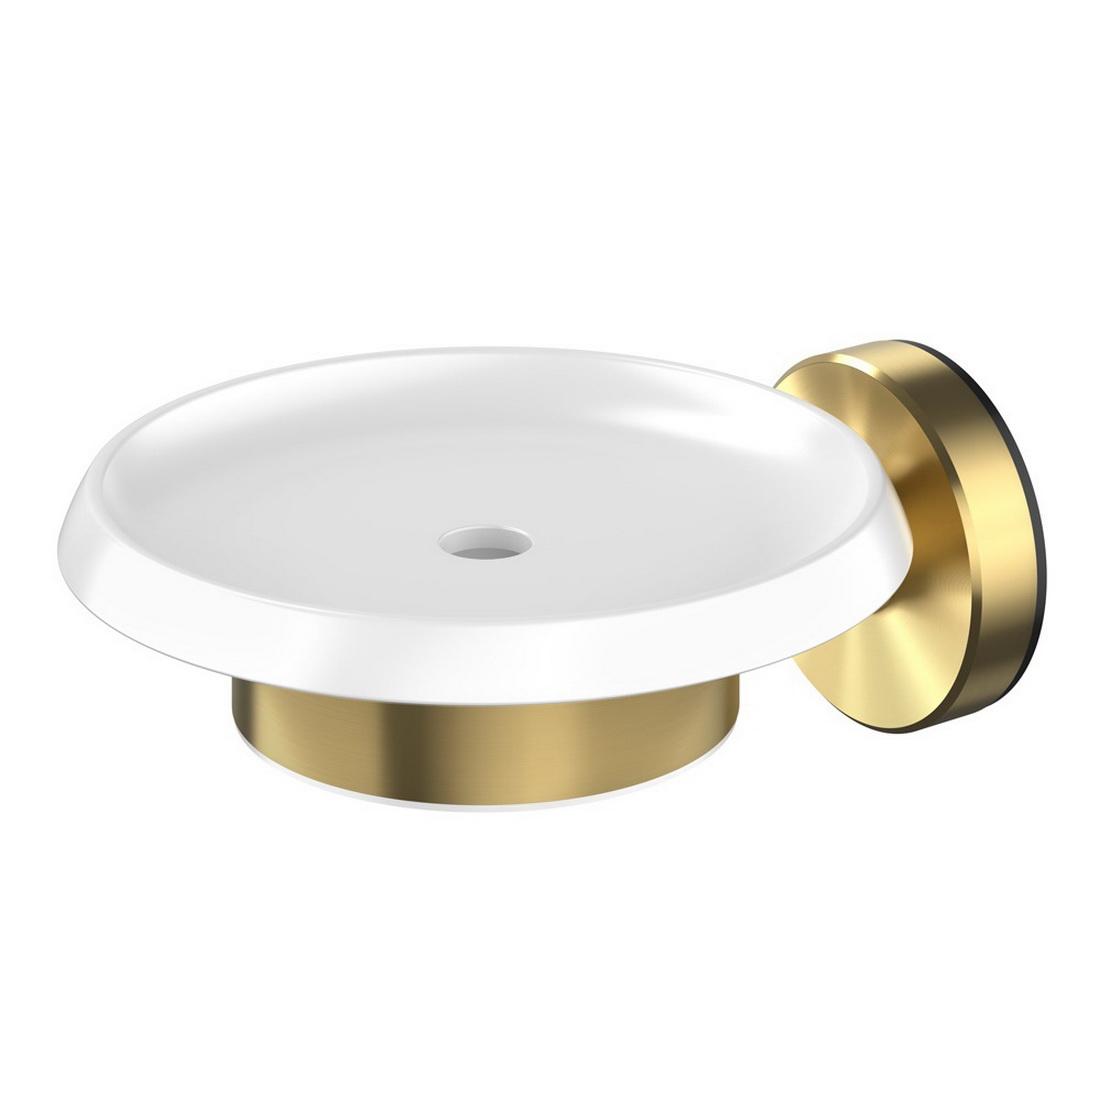 Turoa Soap Dish Brushed Gold